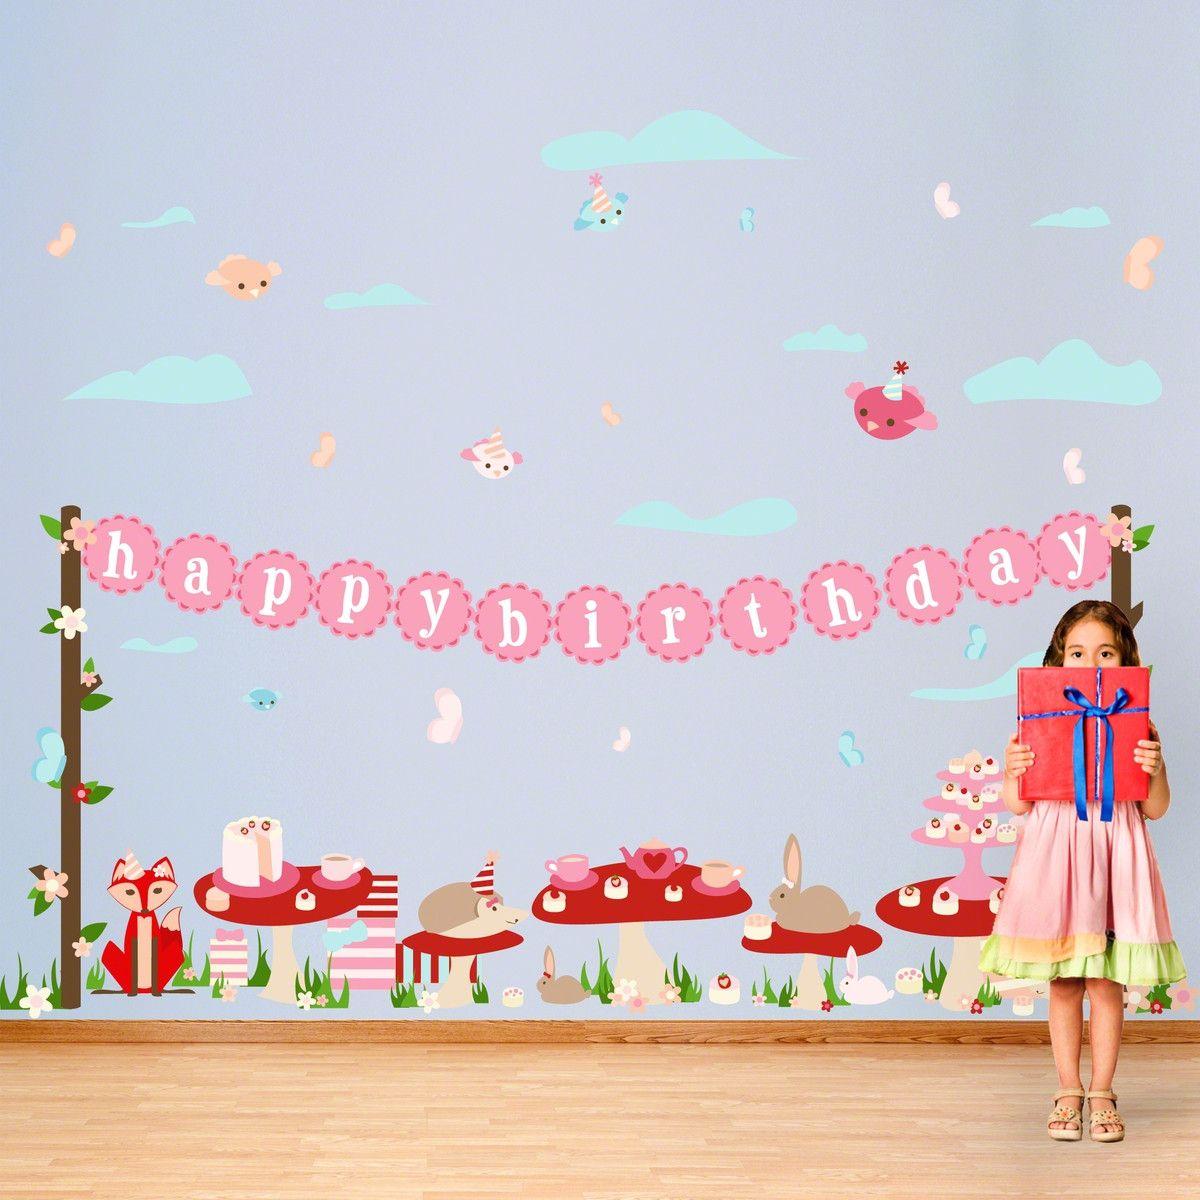 Tea Party Birthday Wall Decal Kit Pinterest Birthday Wall Tea